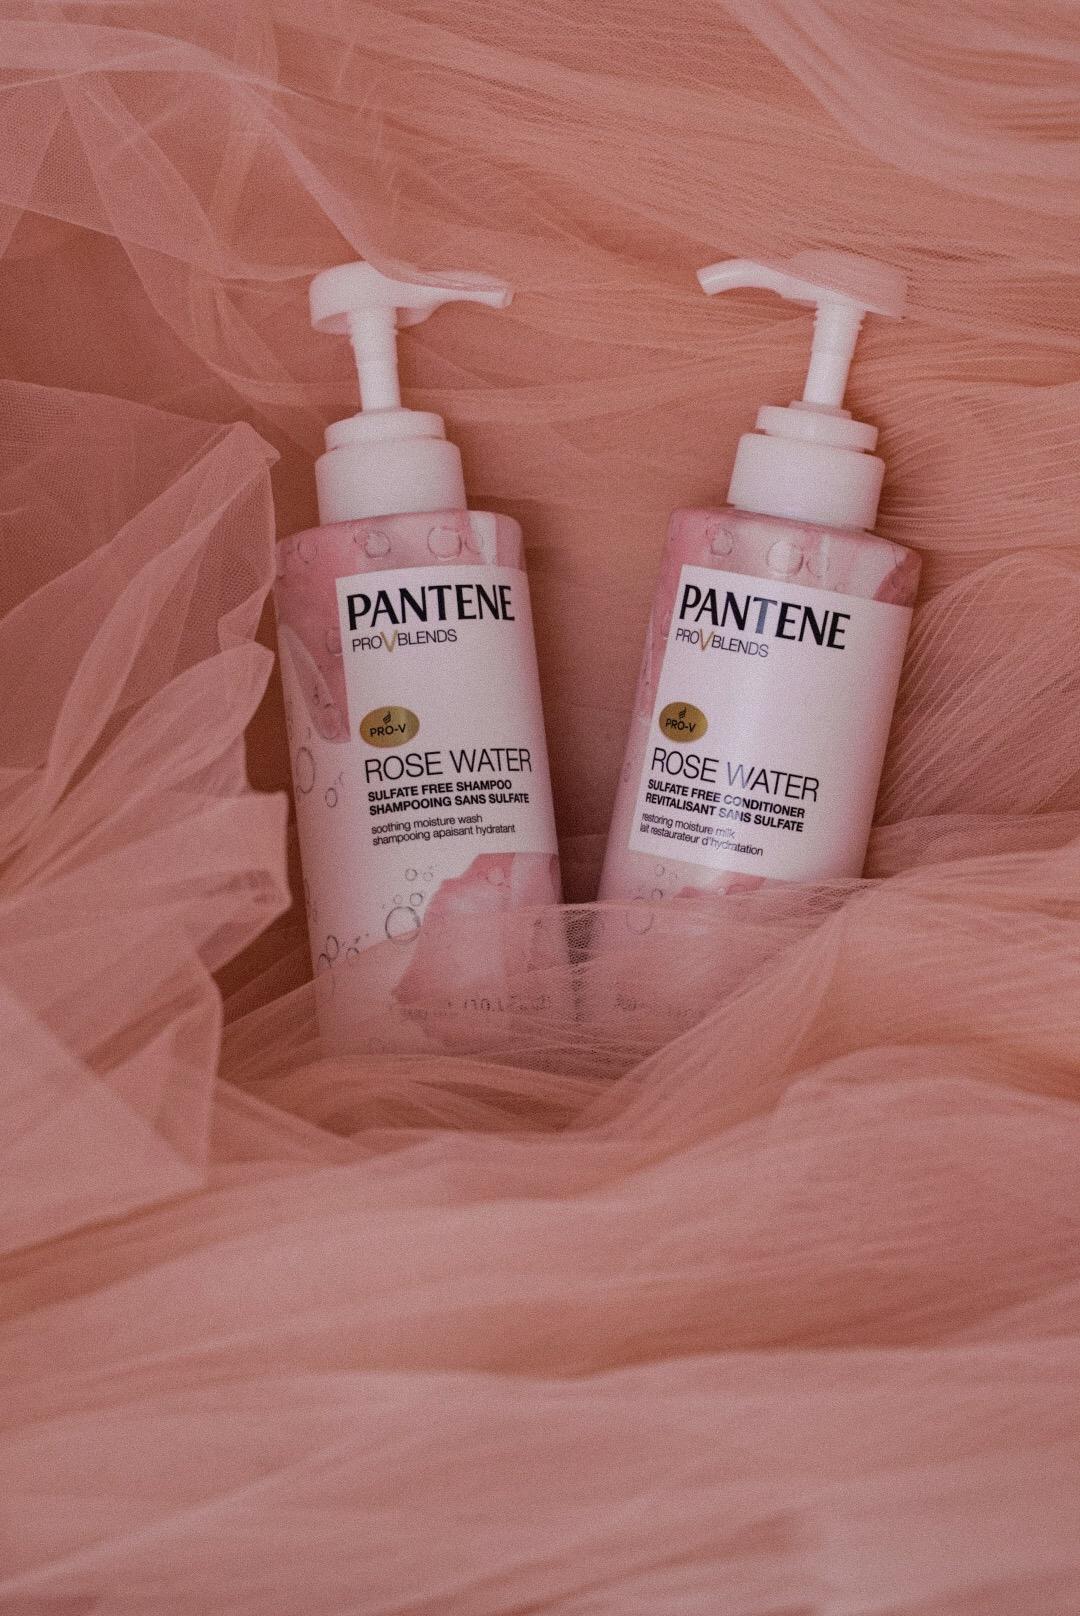 Pantene Blog Photo7.jpg